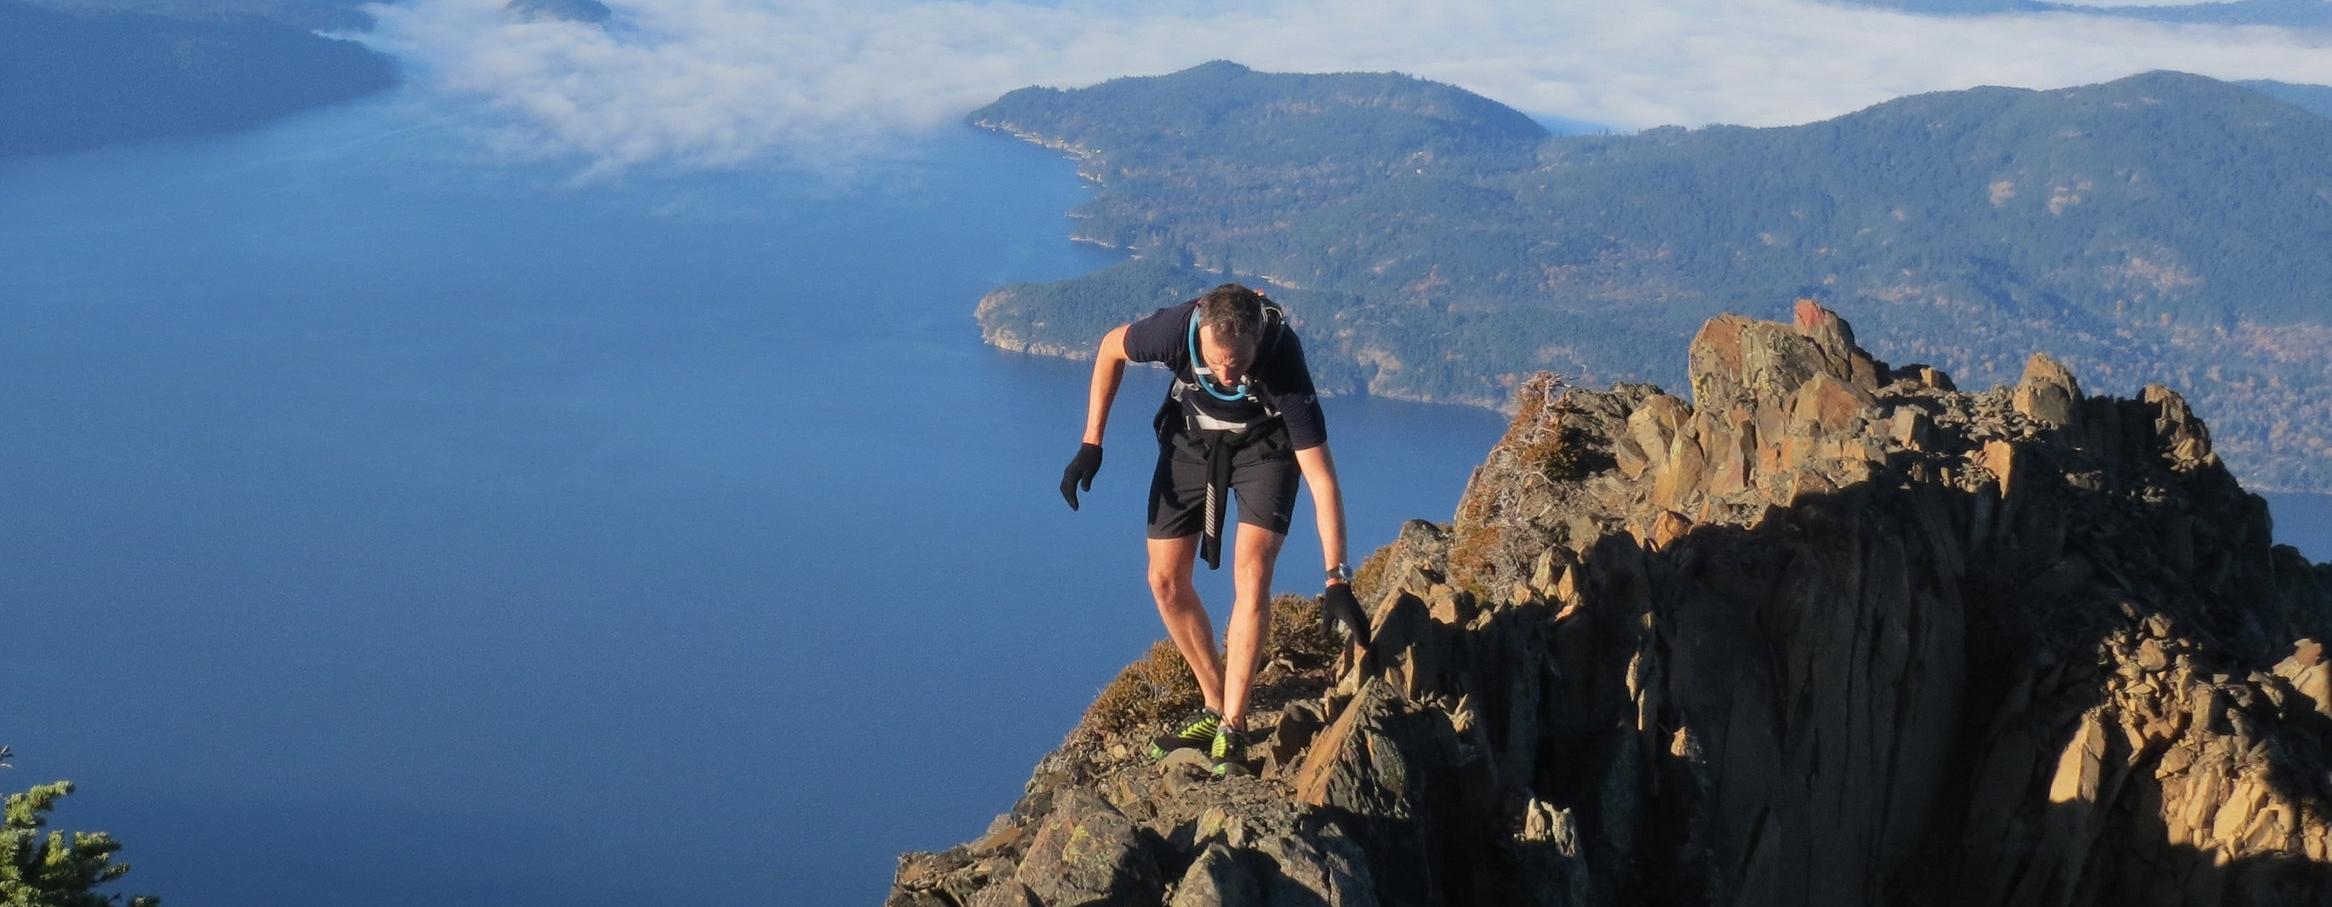 Ridgeline scrambling high on Mt. Brunswick along the Howe Sound Crest Trail.